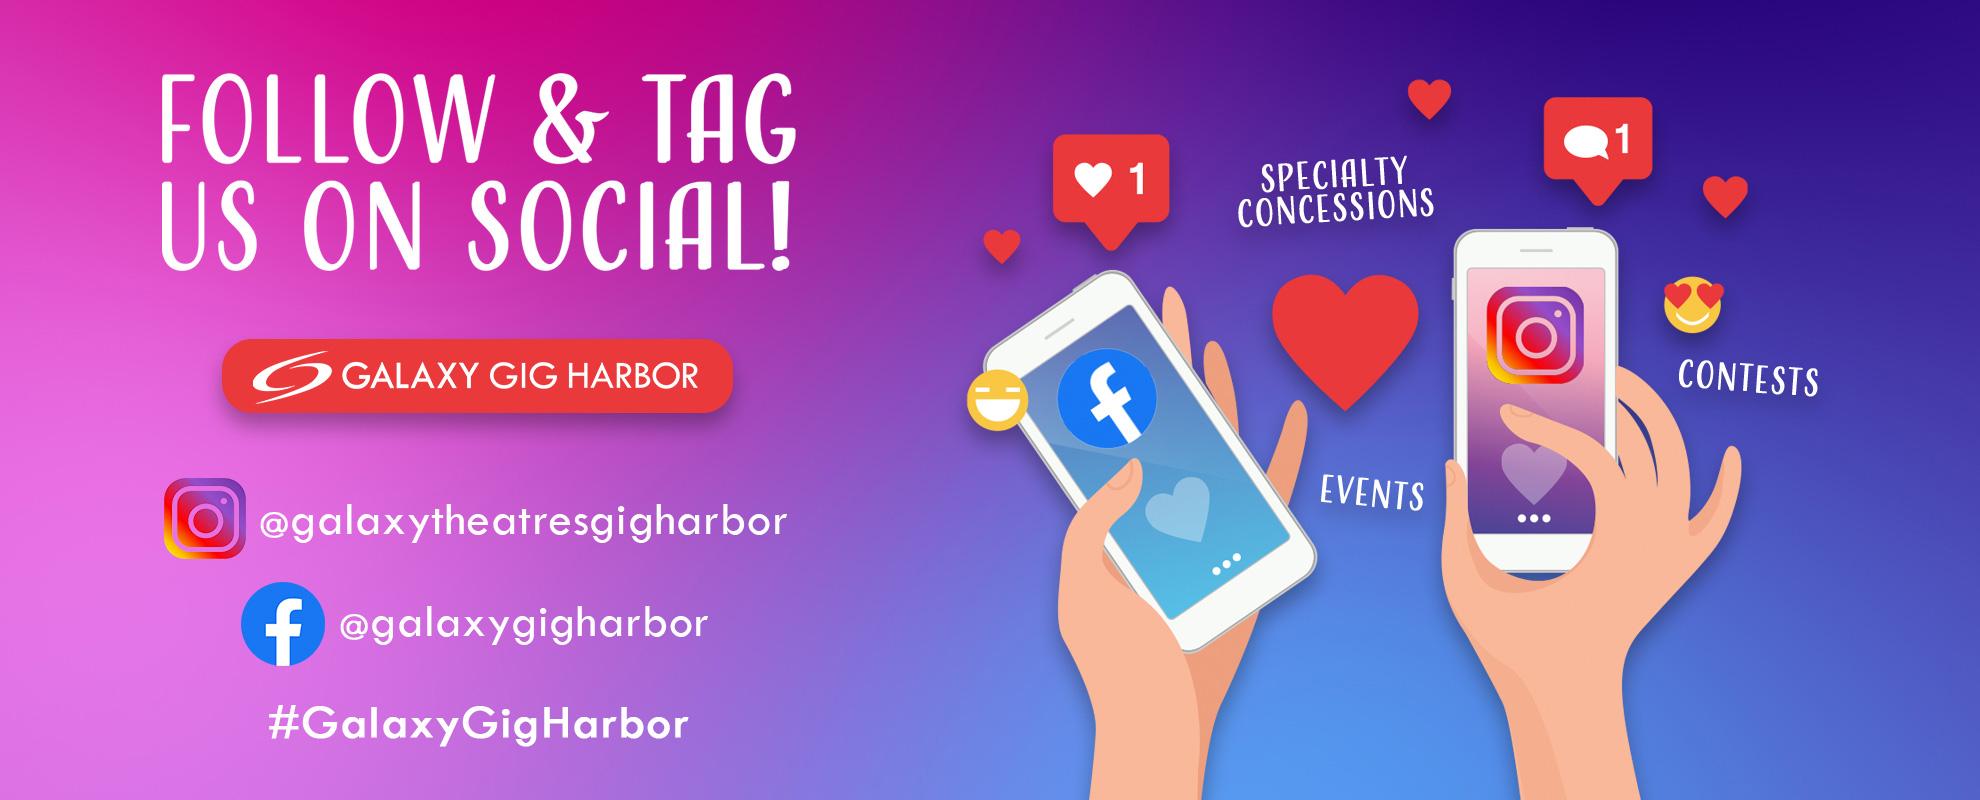 Socials/Hashtag - Gig Harbor image